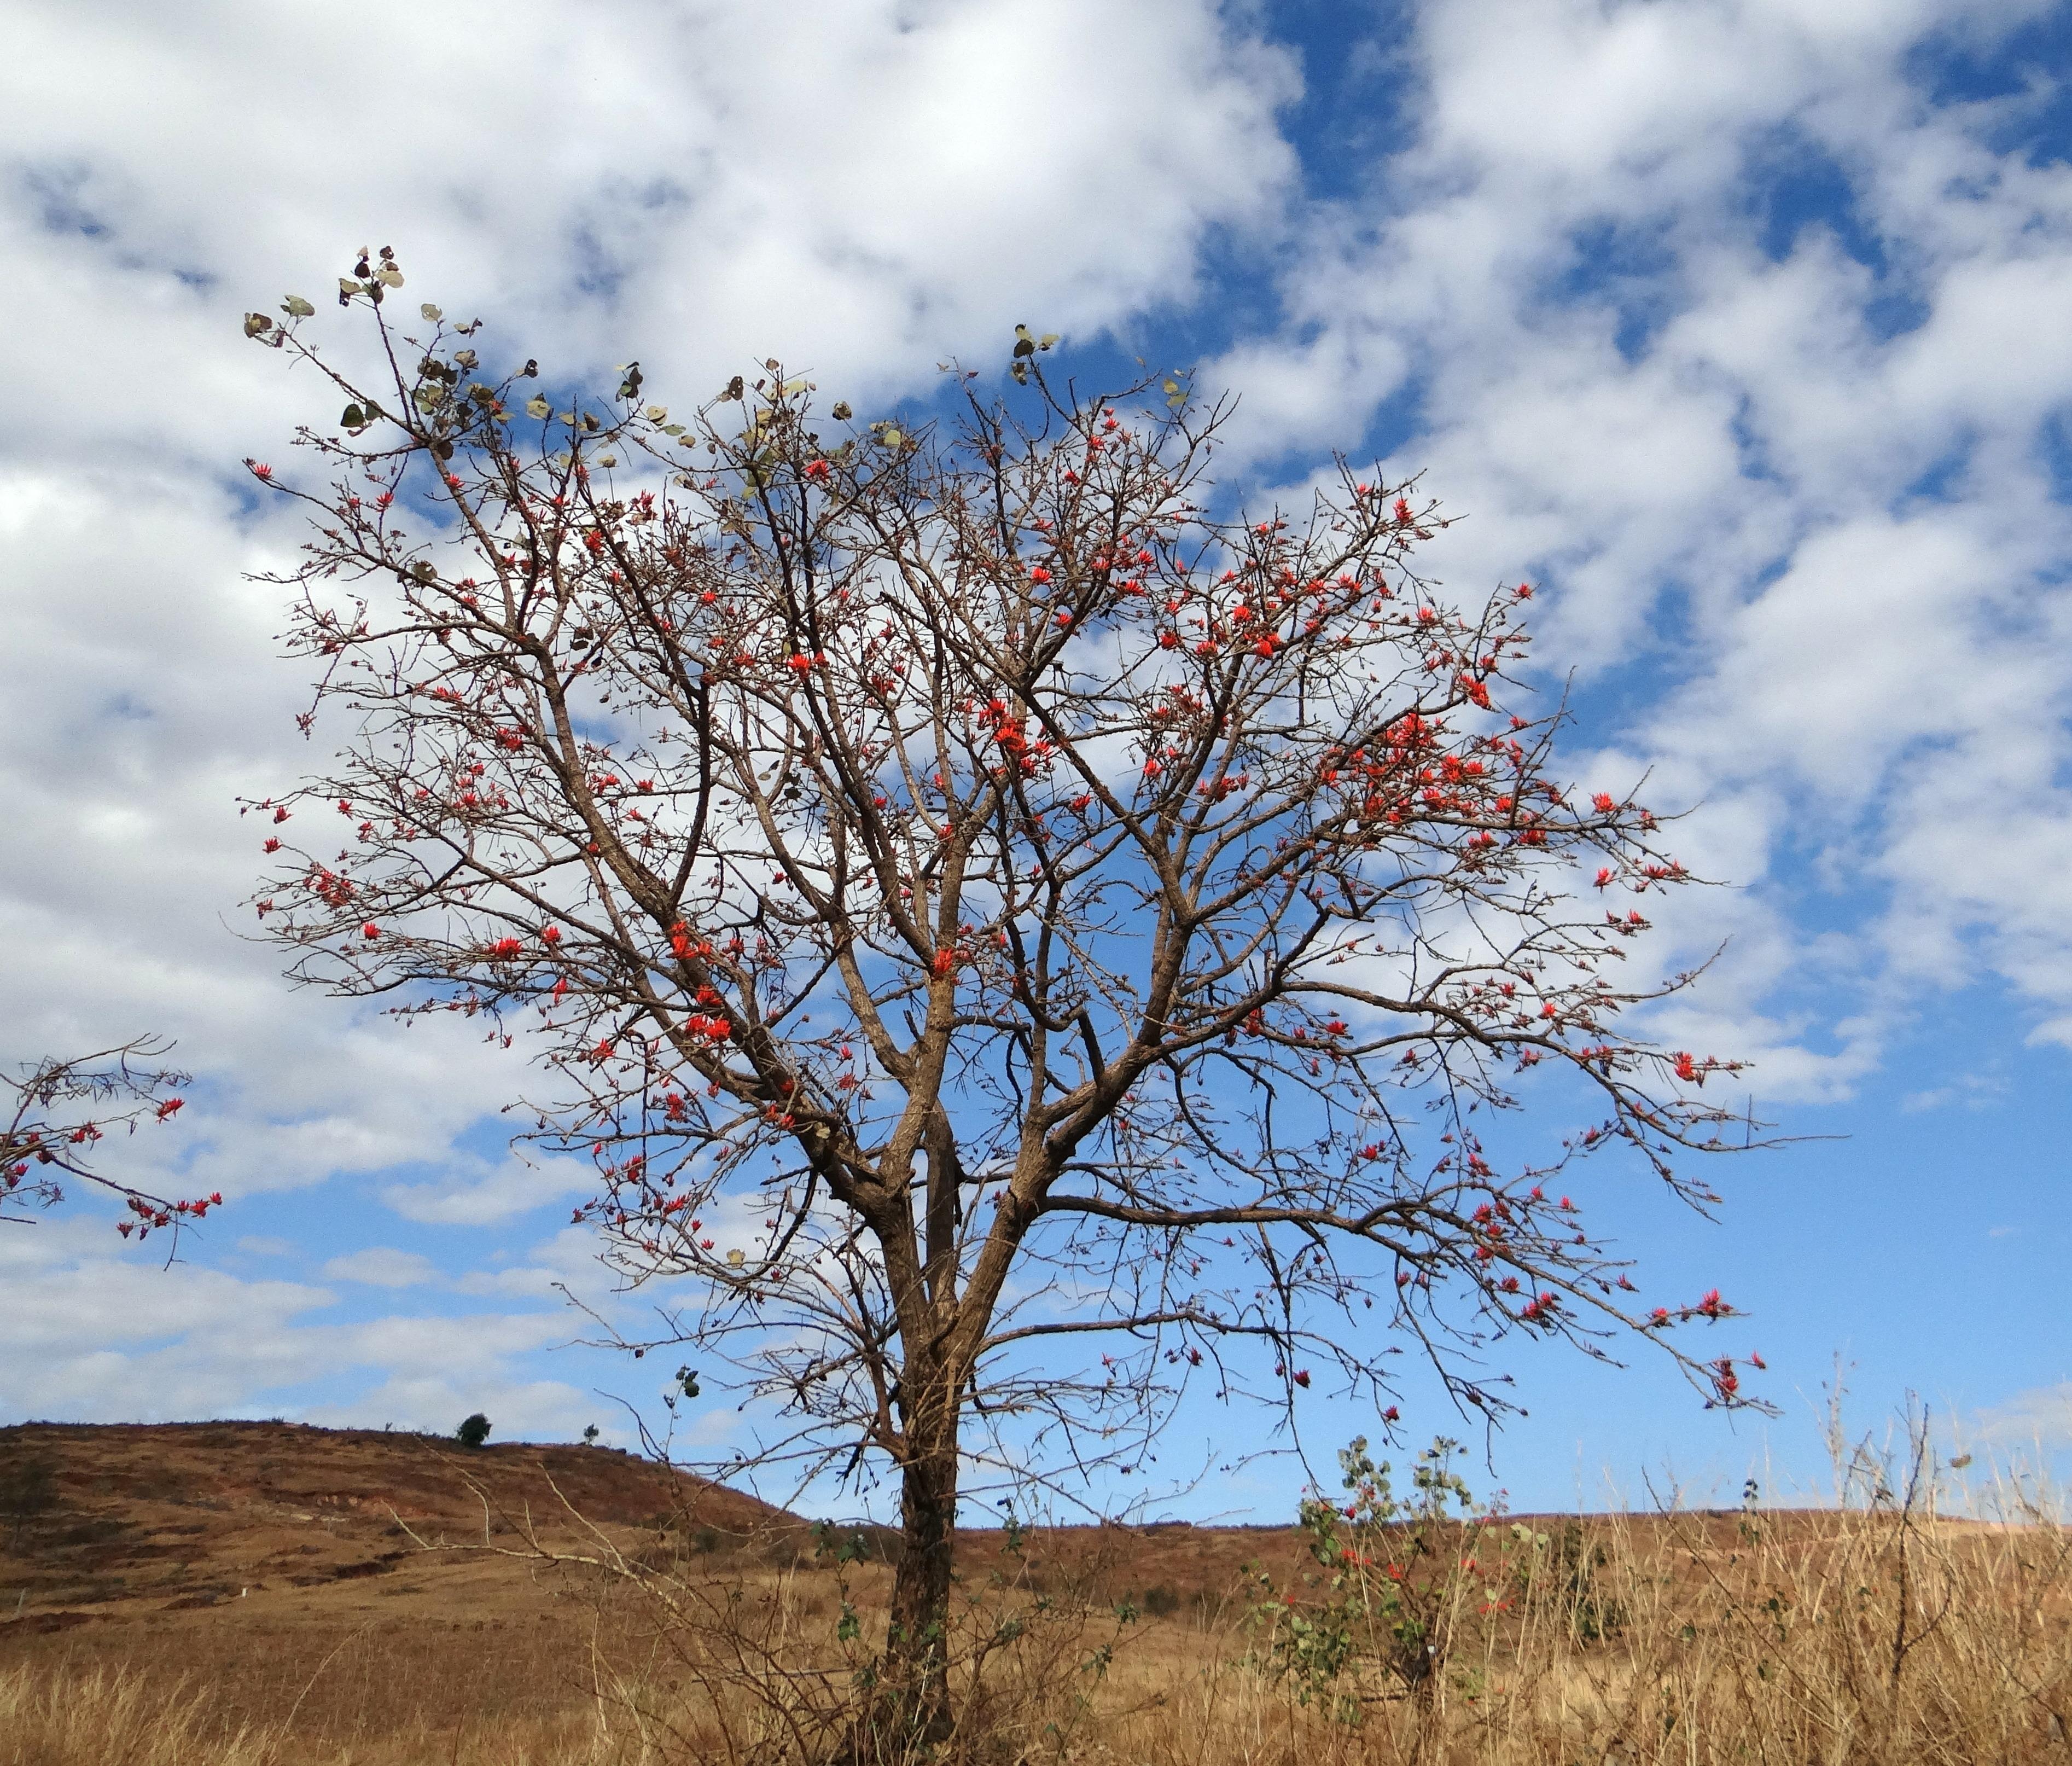 Free Images : Landscape, Nature, Grass, Branch, Blossom